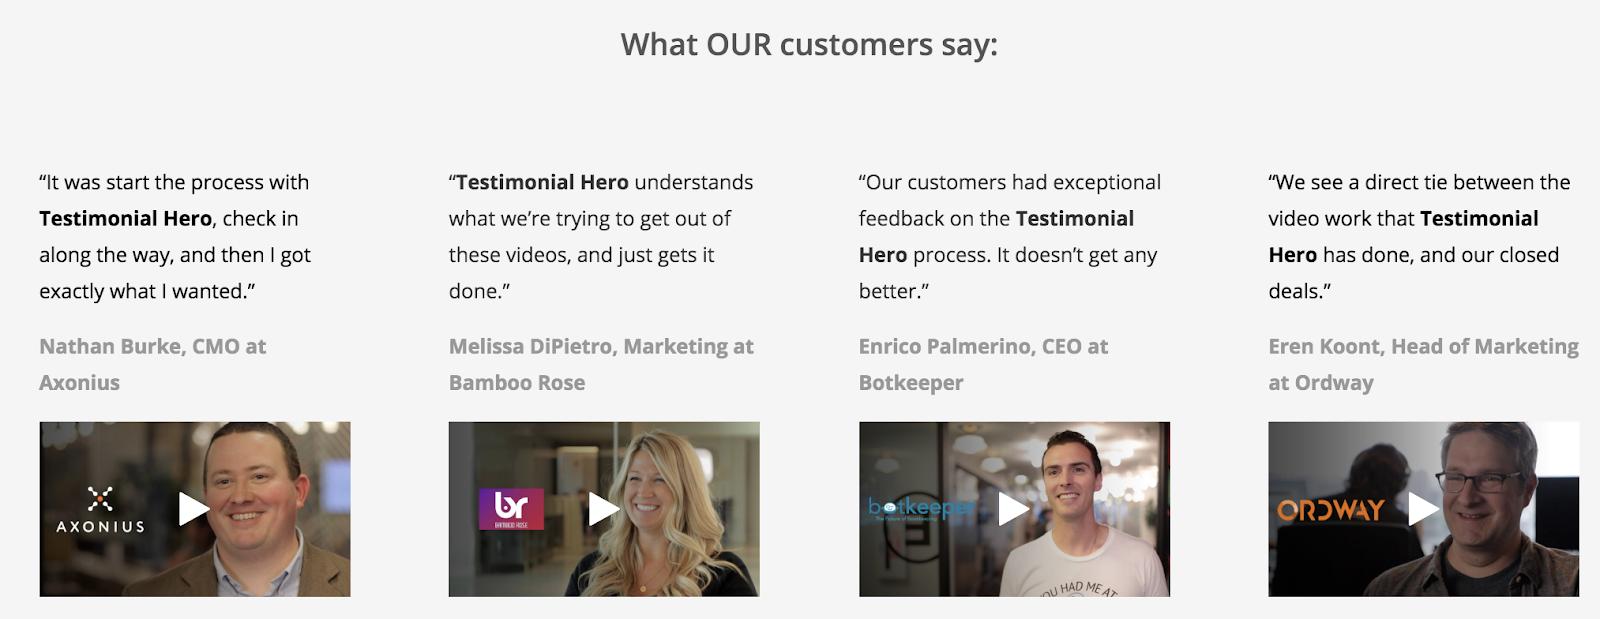 Testimonial Hero displays B2B testimonial videos neatly with quotes.